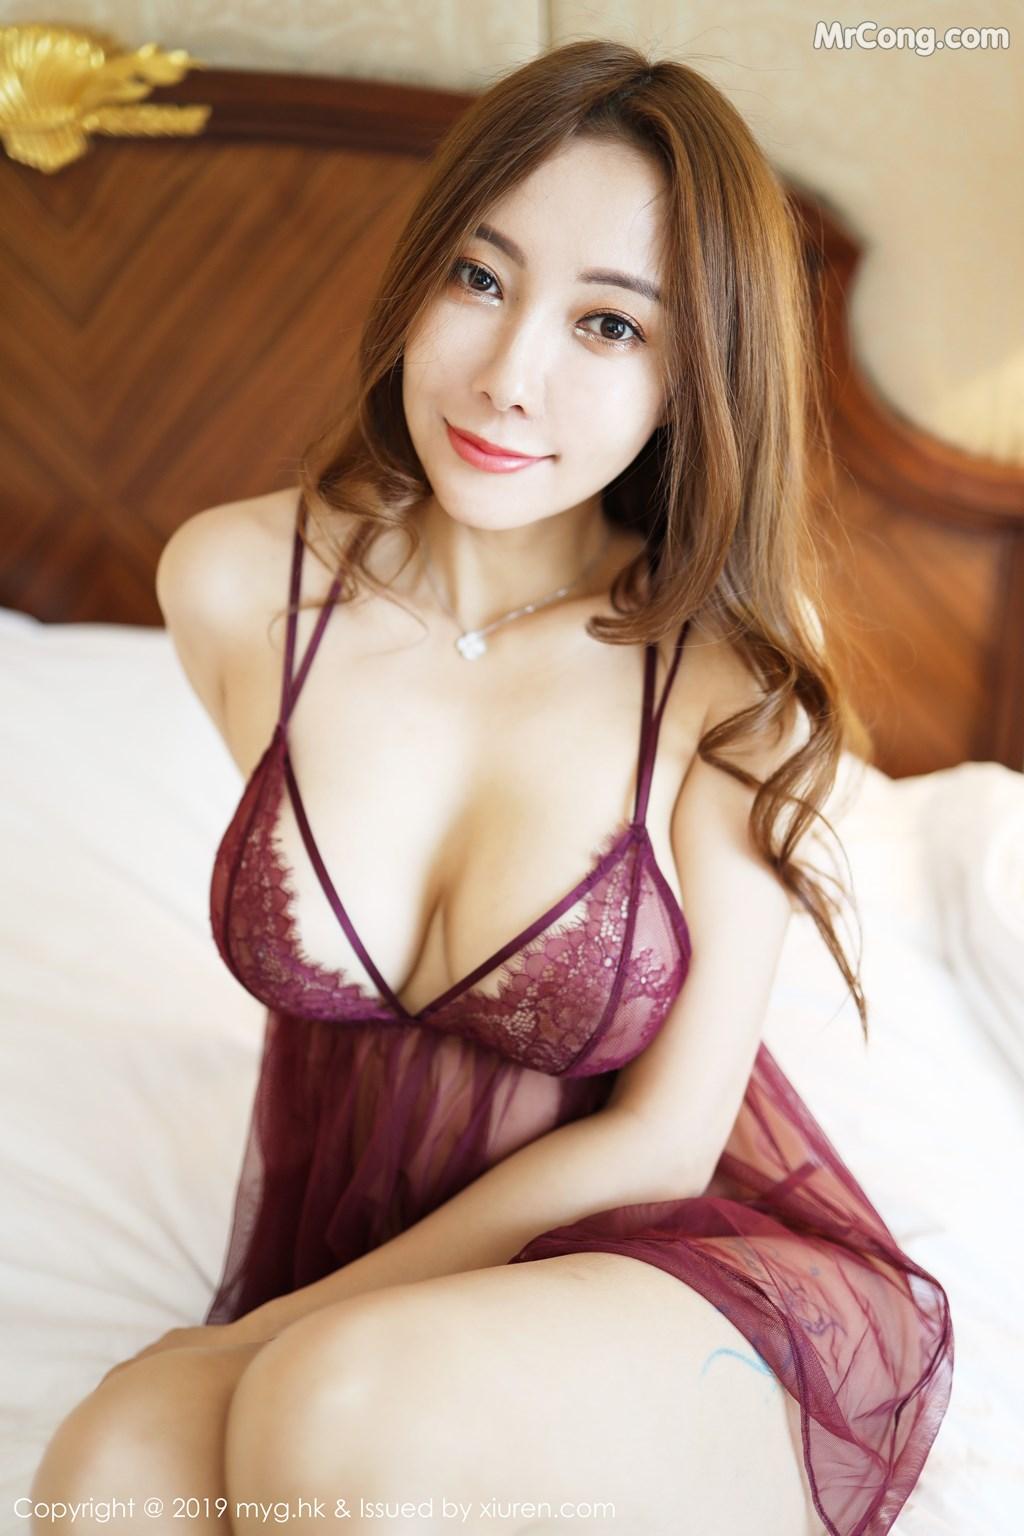 Image MyGirl-Vol.352-Victoria-Guo-Er-MrCong.com-011 in post MyGirl Vol.352: Victoria (果儿) (40 ảnh)